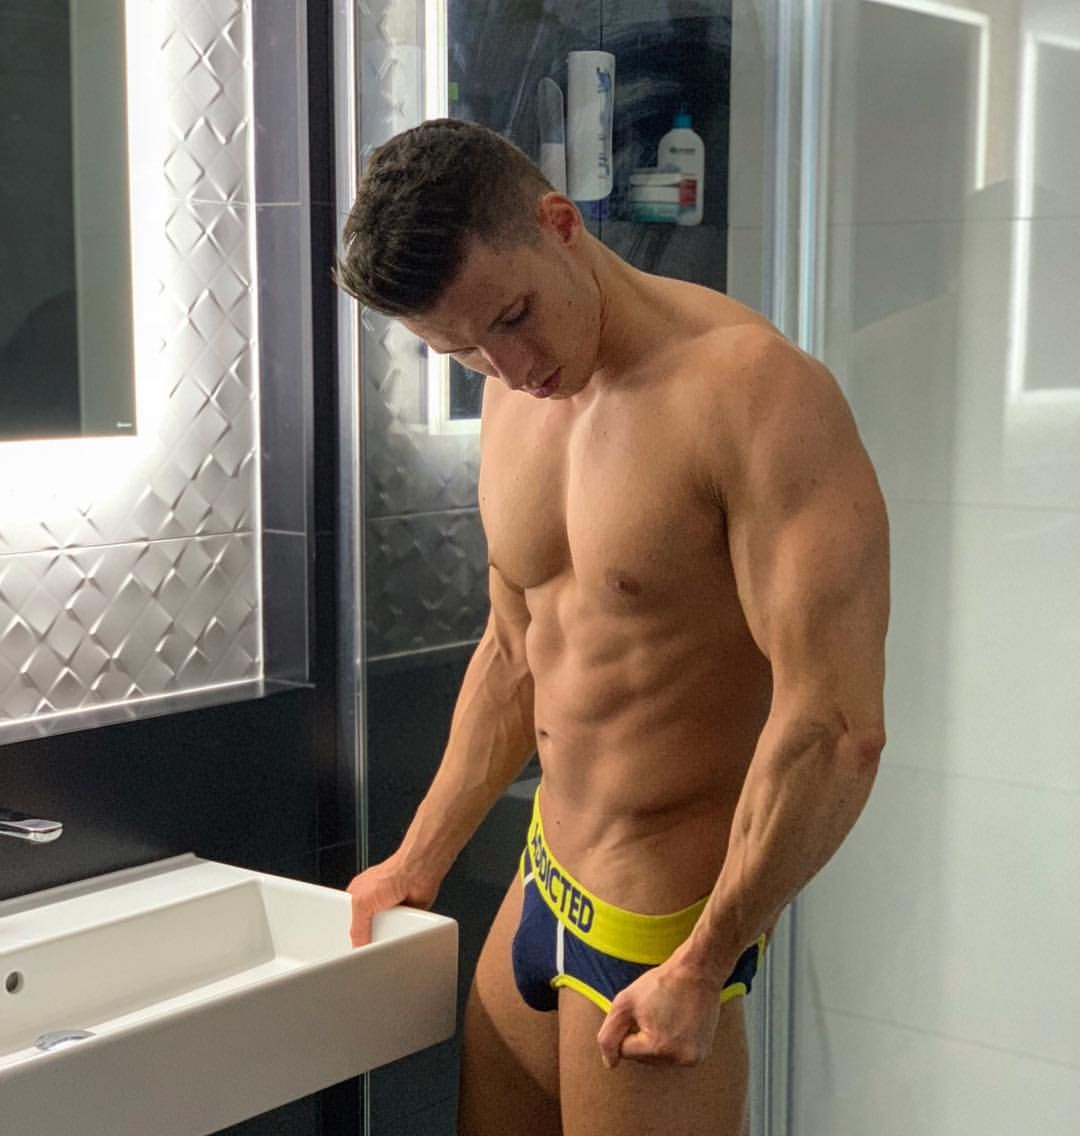 Model Modeling Photography Photo Webcammodel Gay Gaymodel Bisexual